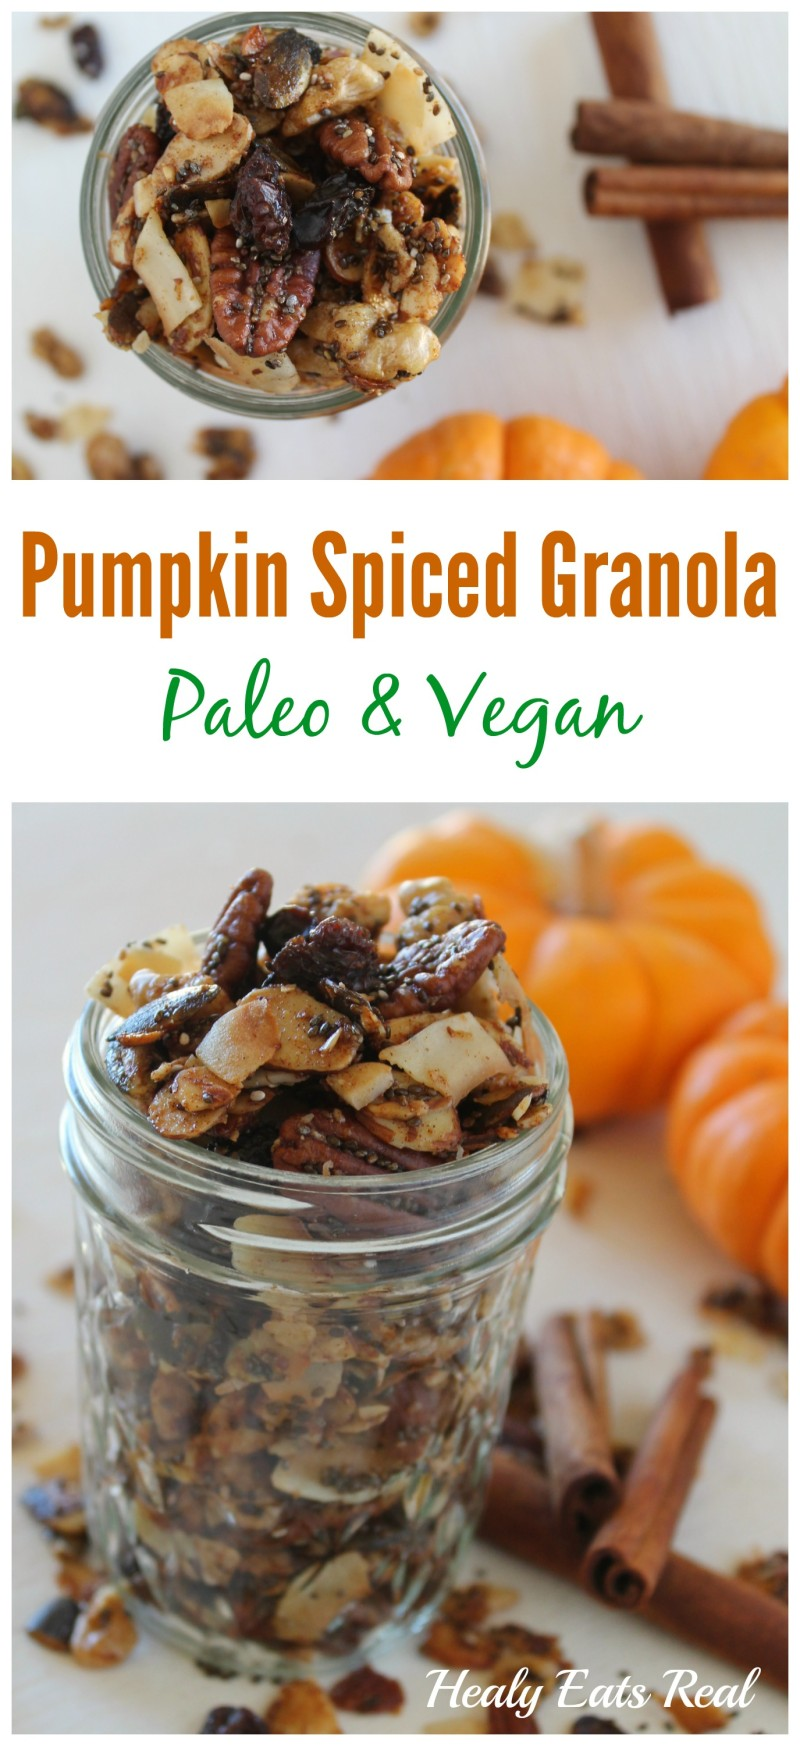 Paleo Pumpkin Spiced Granola -  top view